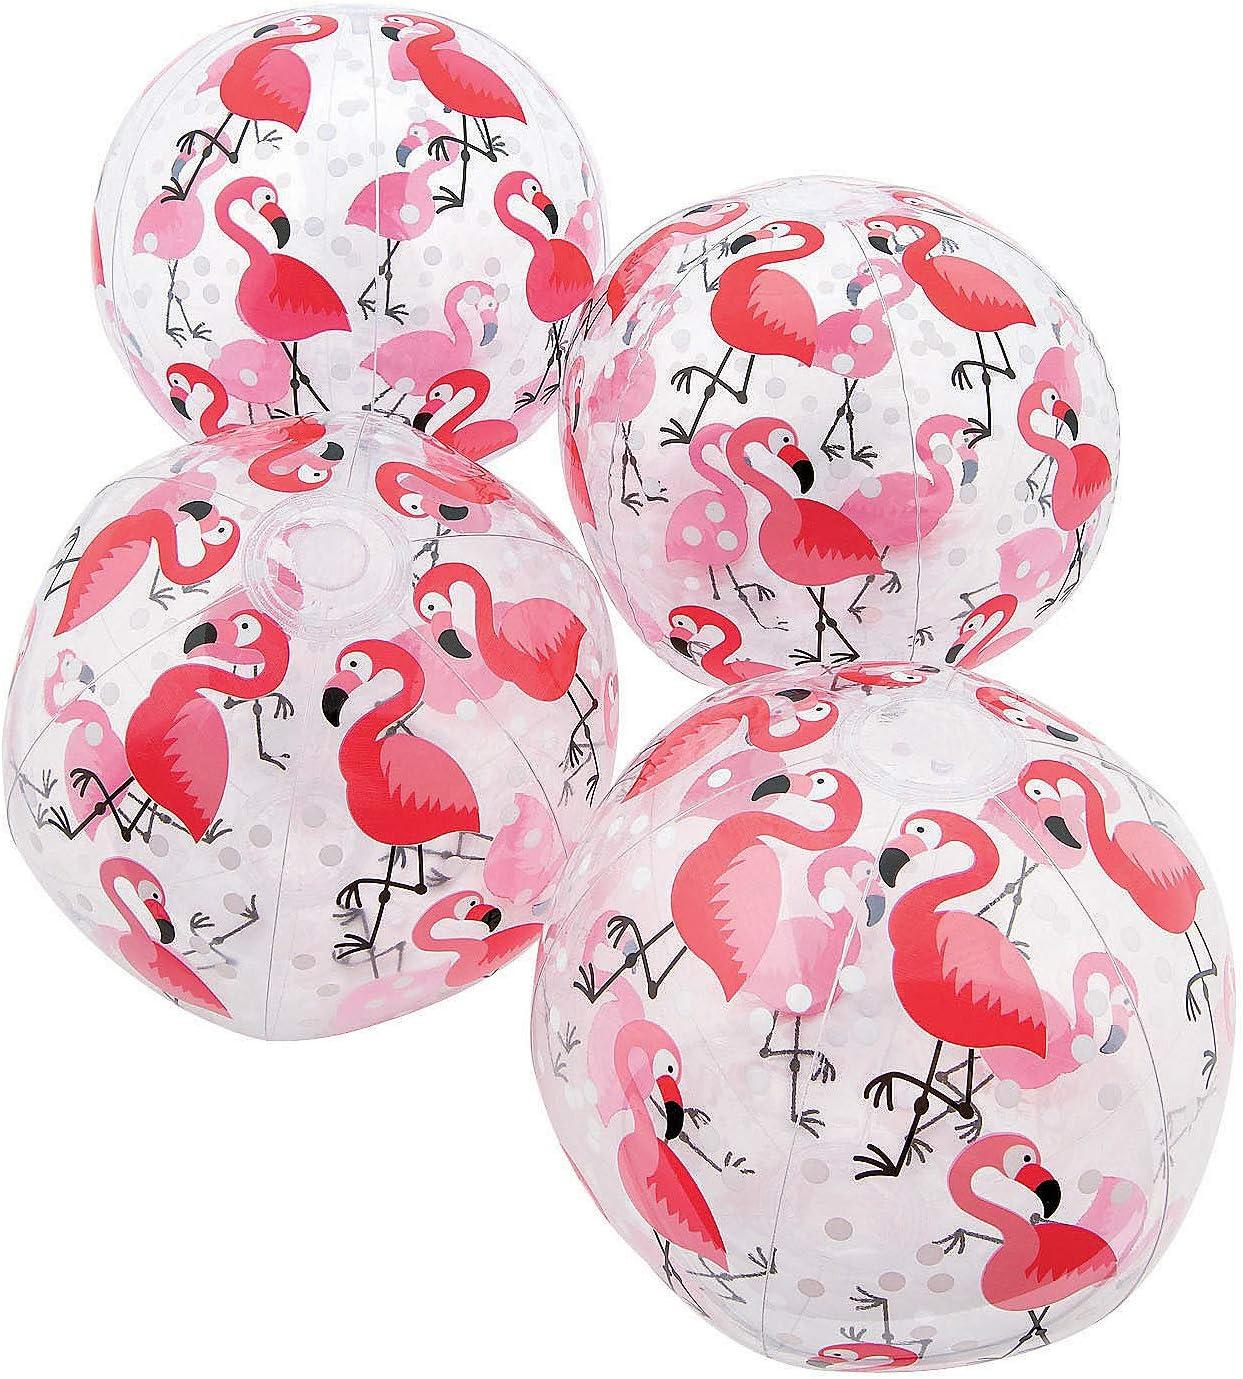 Fun Express Oakland Mall Flamingo Print Beach Pieces Safety and trust - 12 Balls Toys